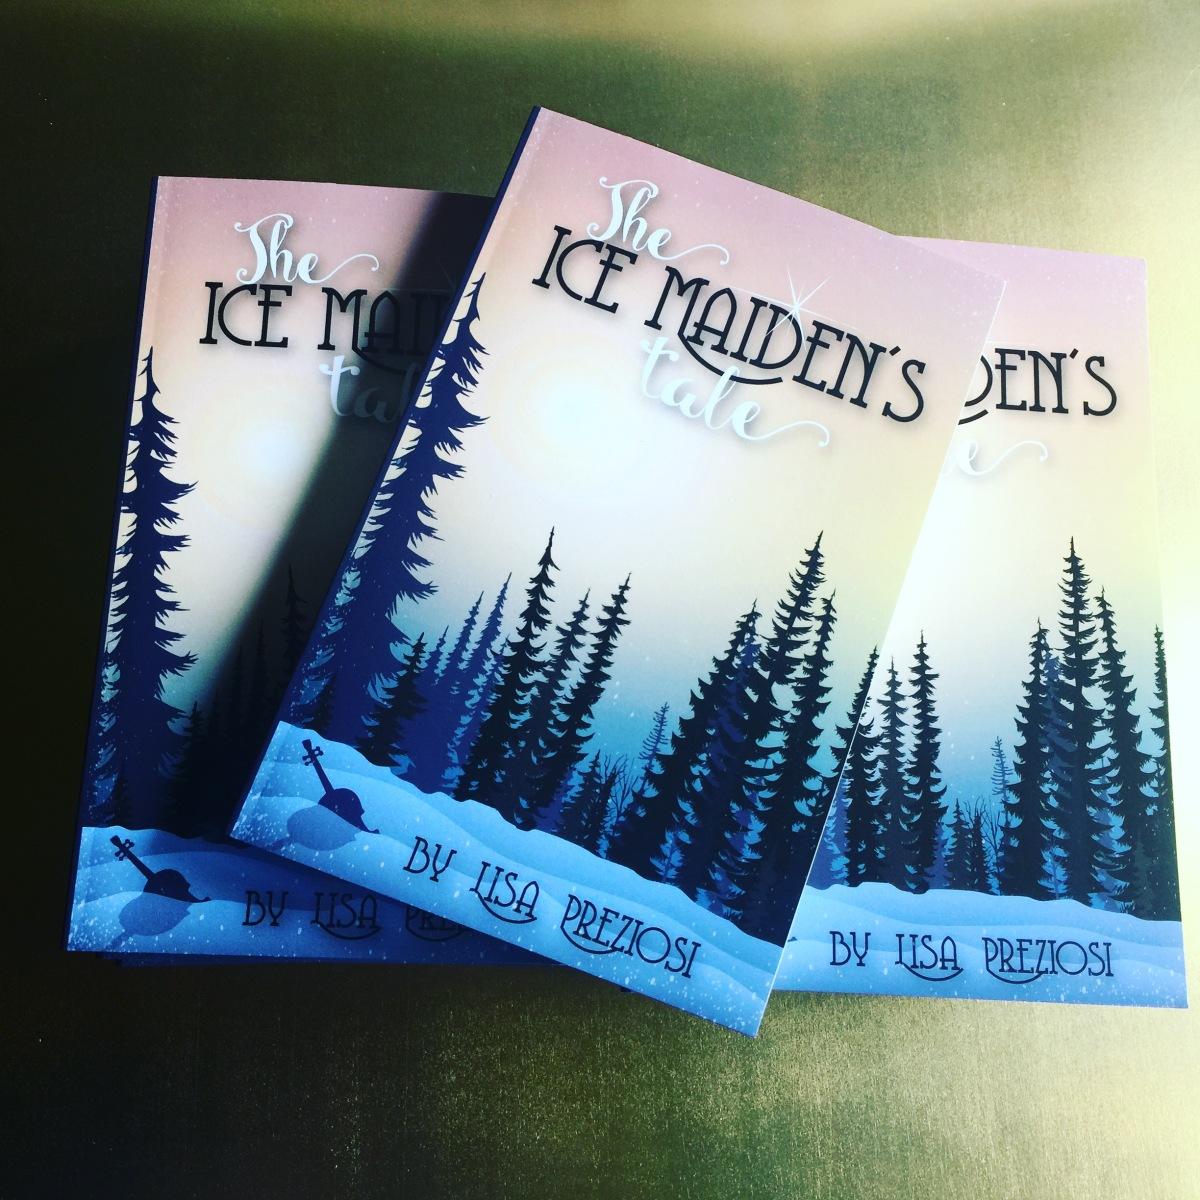 Writer's Shelf: The Ice Maiden's TaleLaunch!